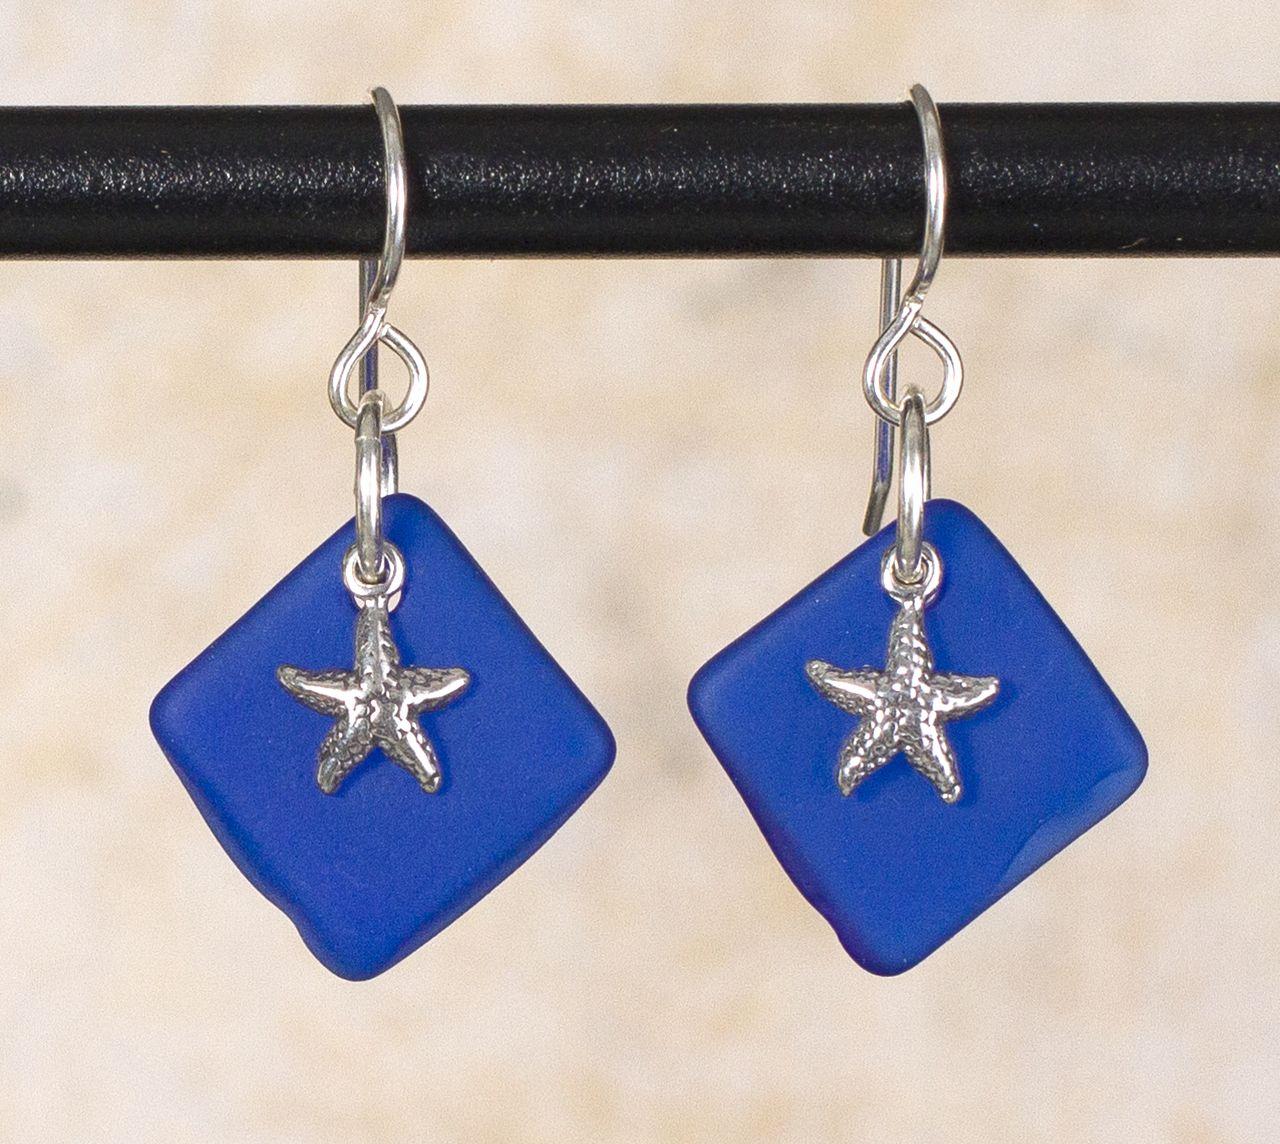 Seaglass starfish charm earrings a a wonderful sea glass beach